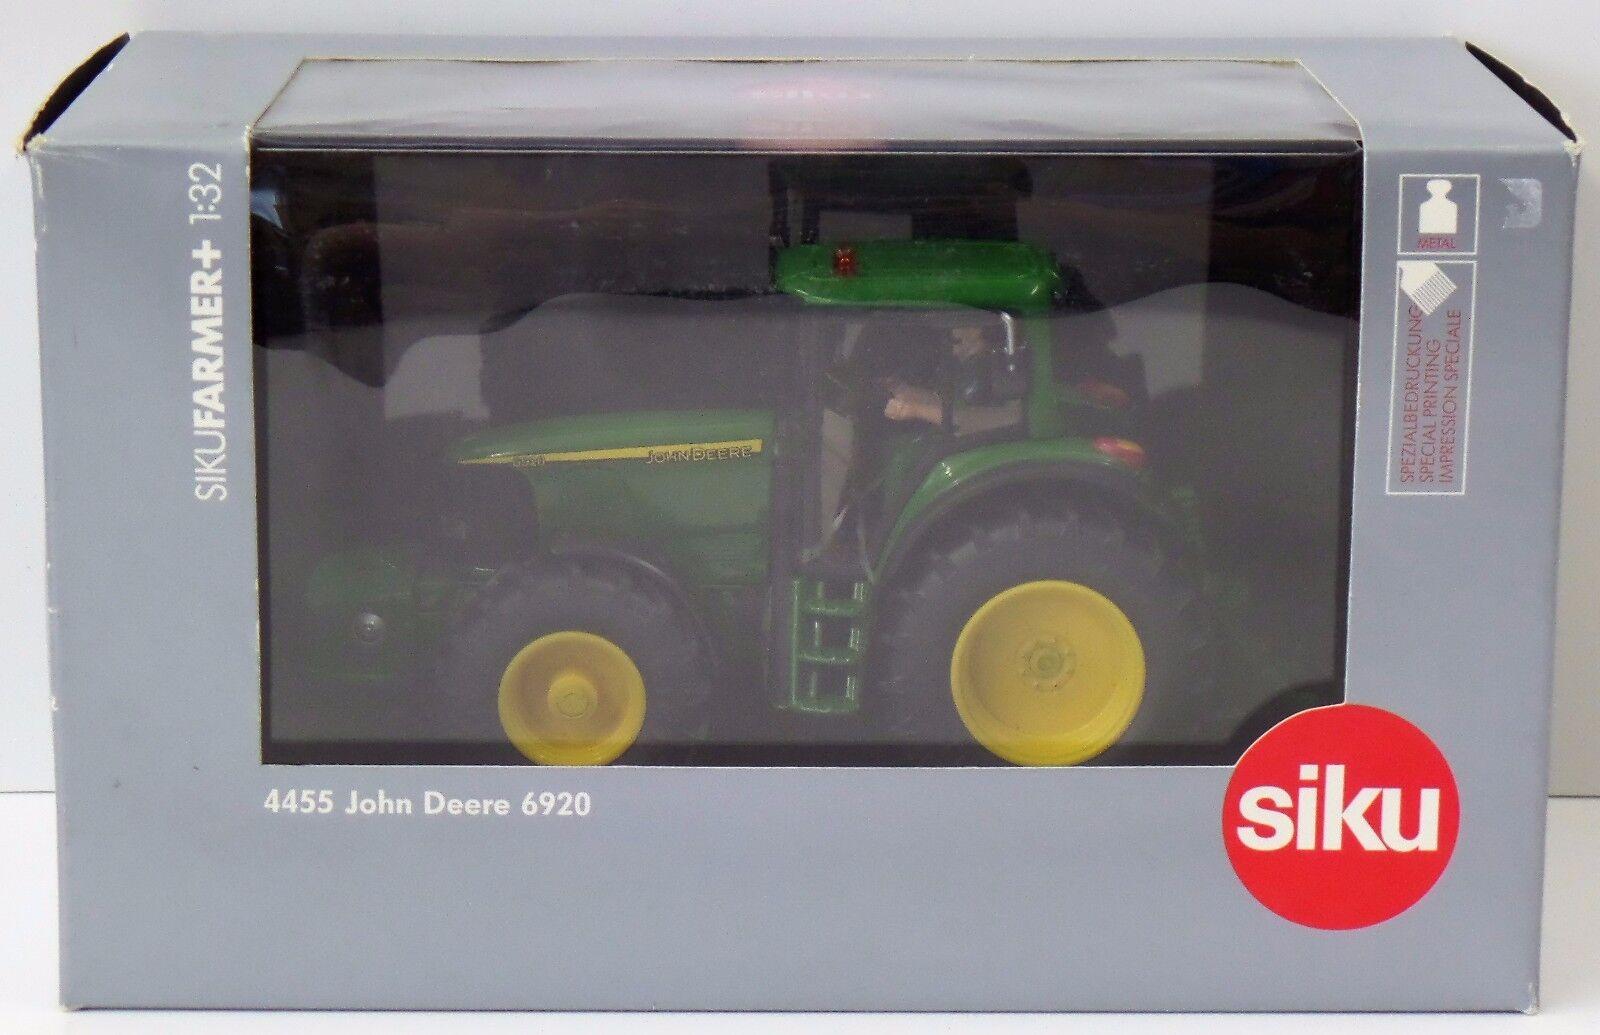 Siku Farmer + 1 32 - 4455 John Deere 6920-SCATOLA ORIGINALE NUOVO NEW